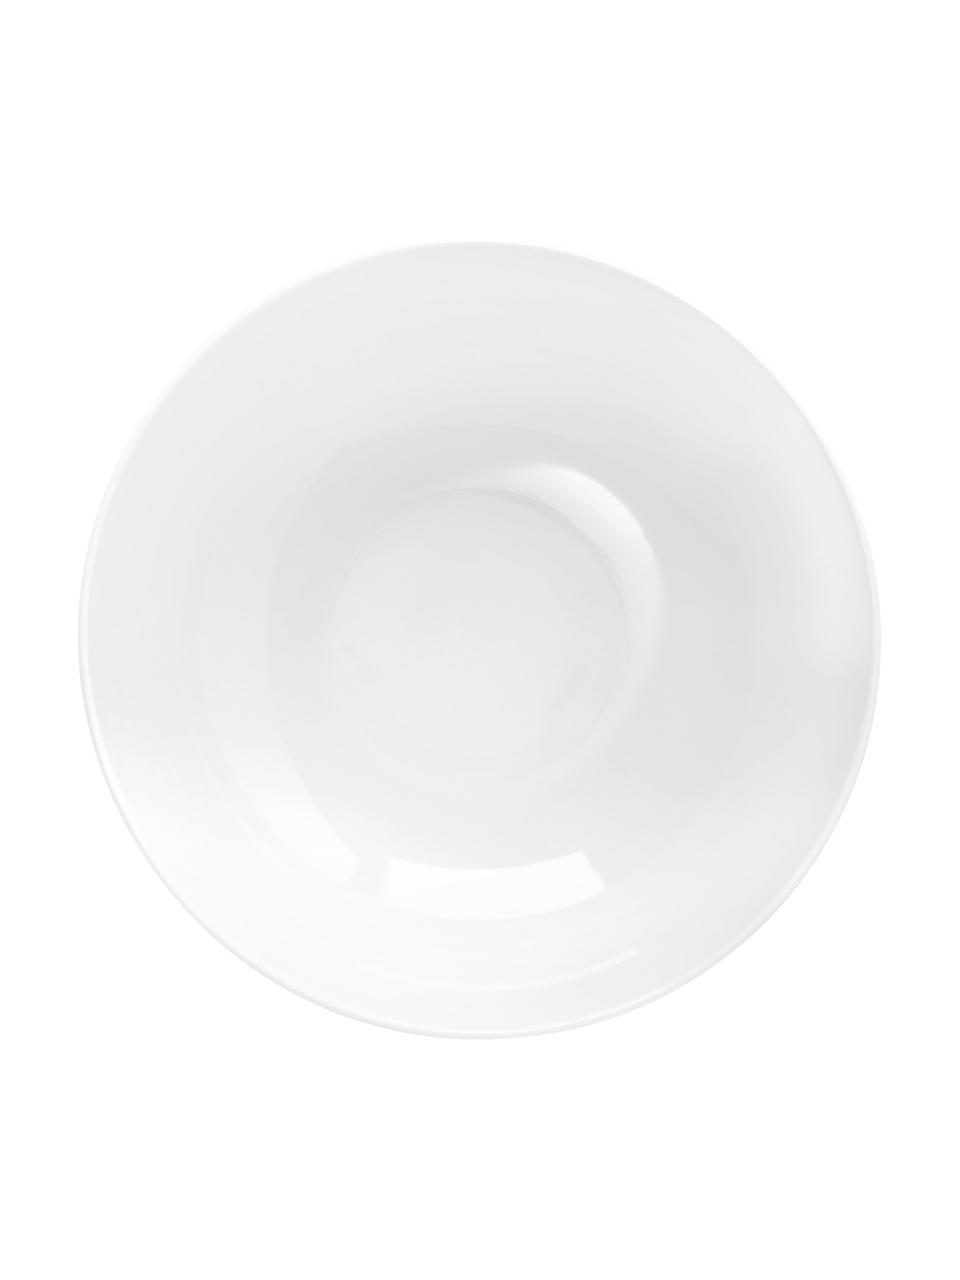 Salatschüssel Puro aus Porzellan, Ø 25 cm, Porzellan, Weiß, Ø 25 x H 10 cm